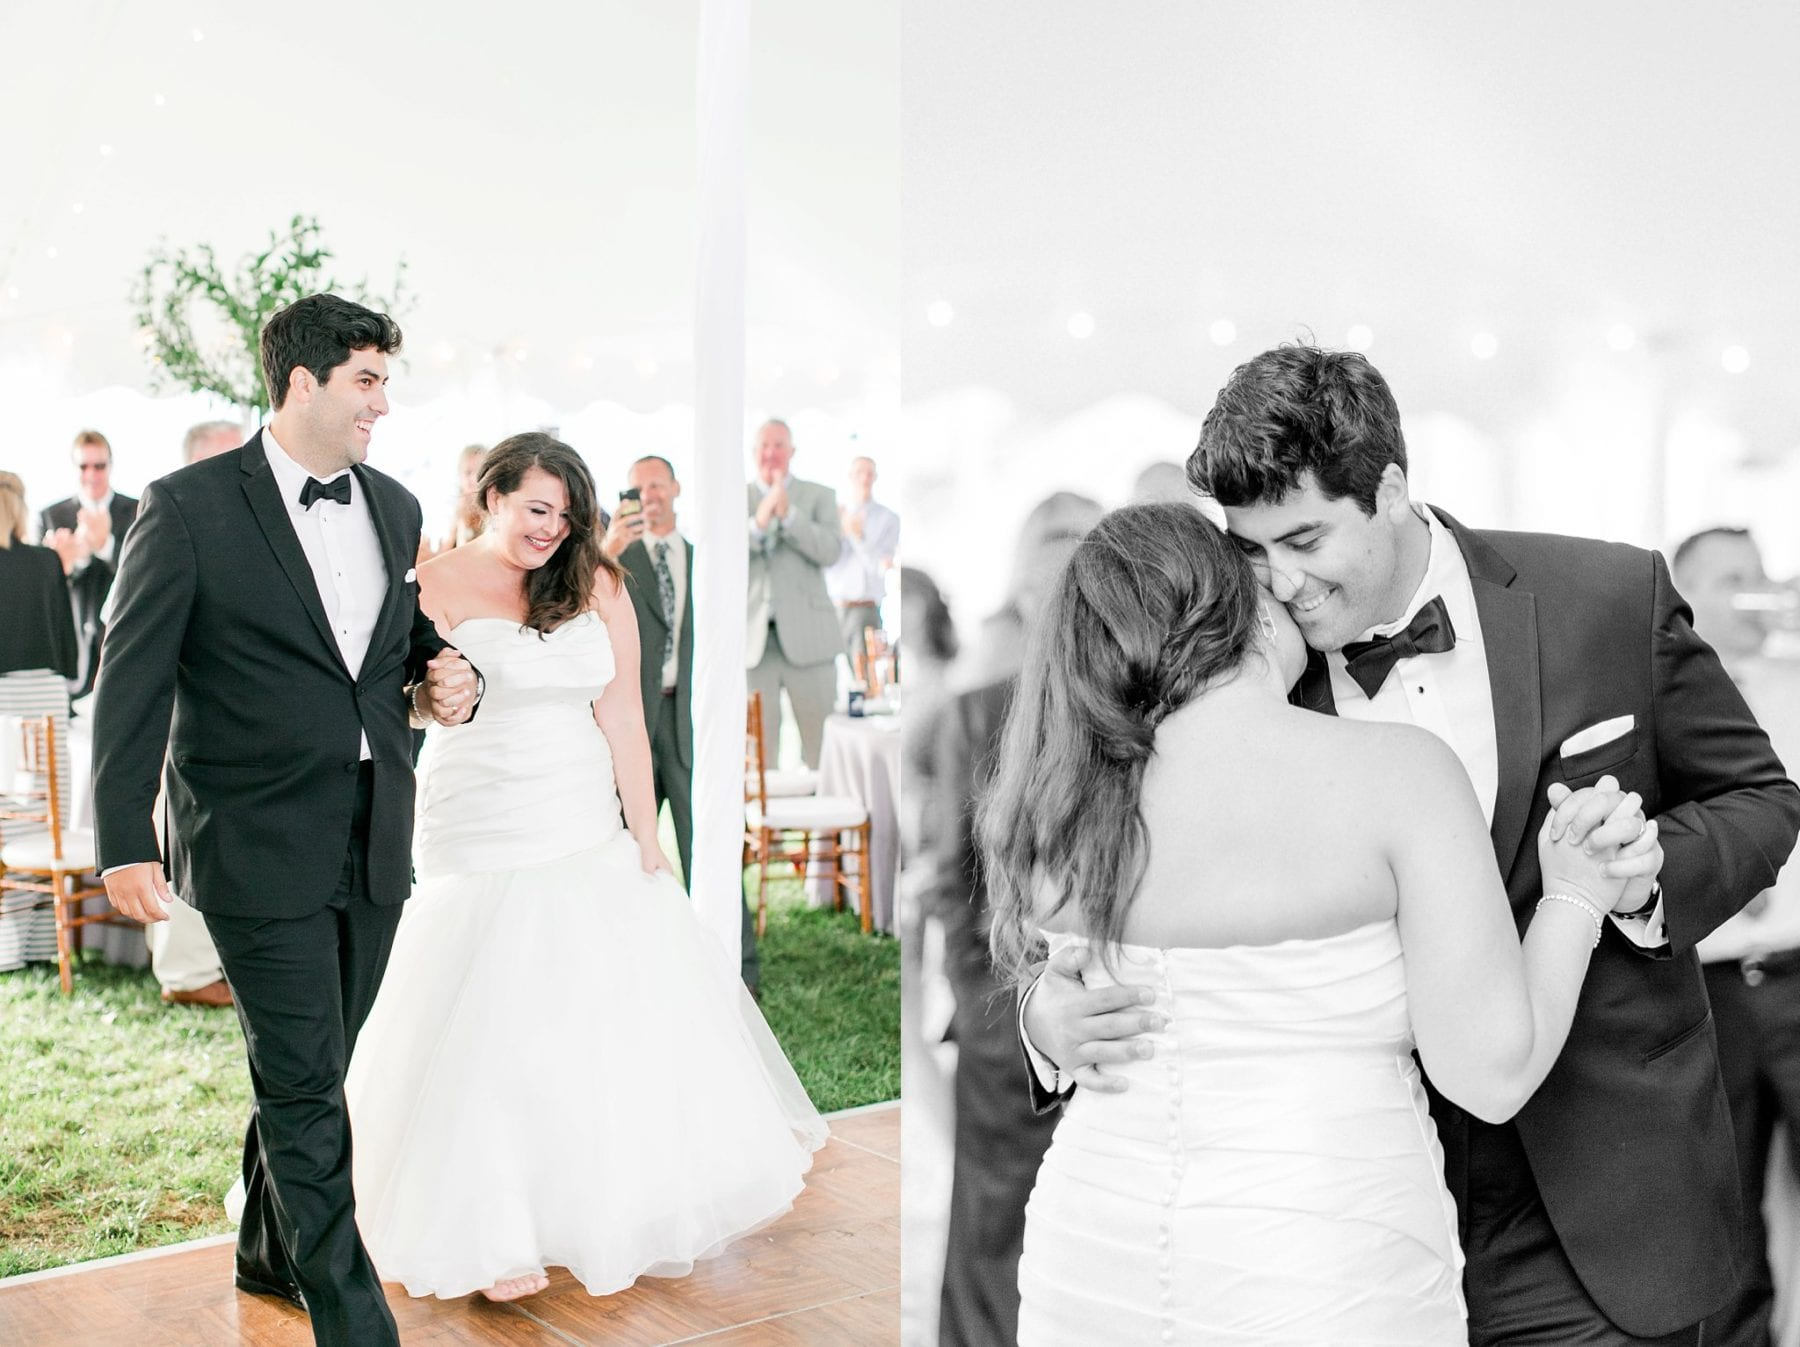 Chesapeake Bay Maritime Museum Wedding Photos Maryland Wedding Photographer Megan Kelsey Photography Halie & Mike-164.jpg